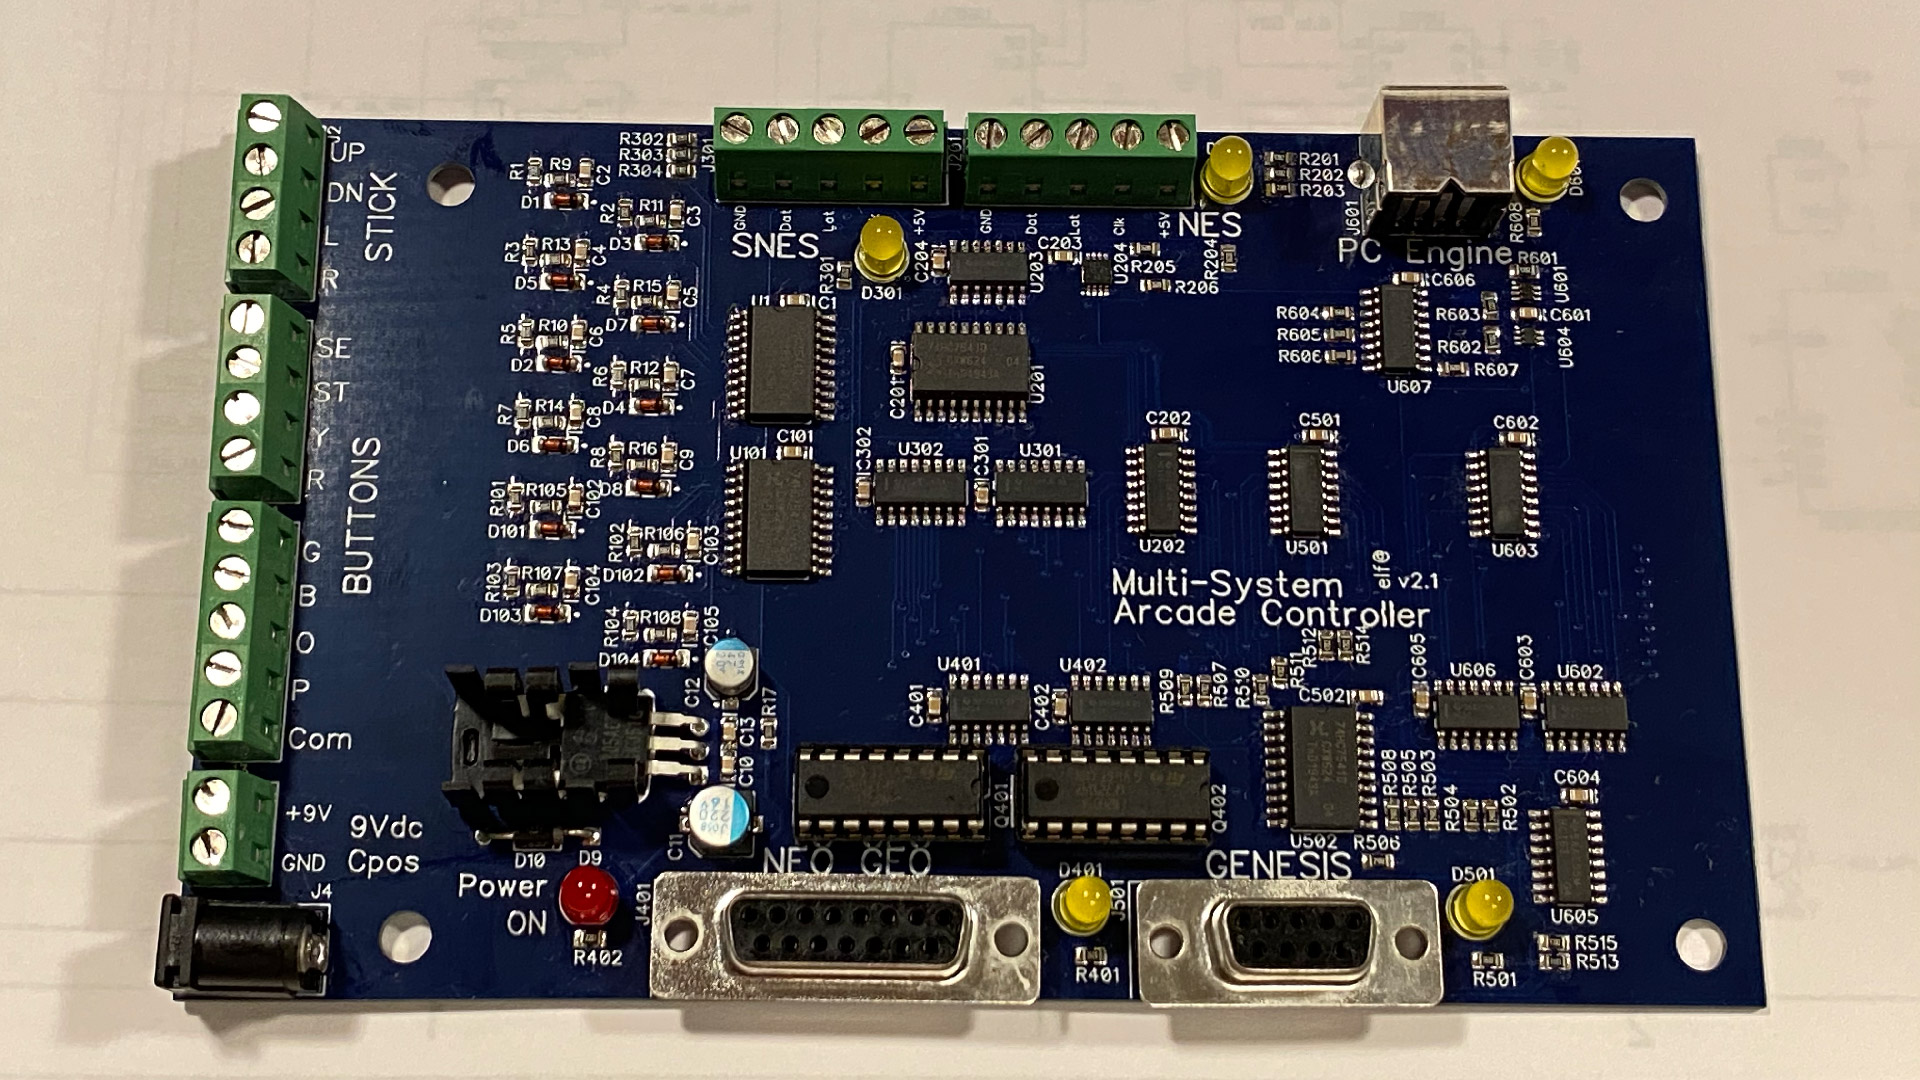 Arcade Controller v2.1 - board.jpg